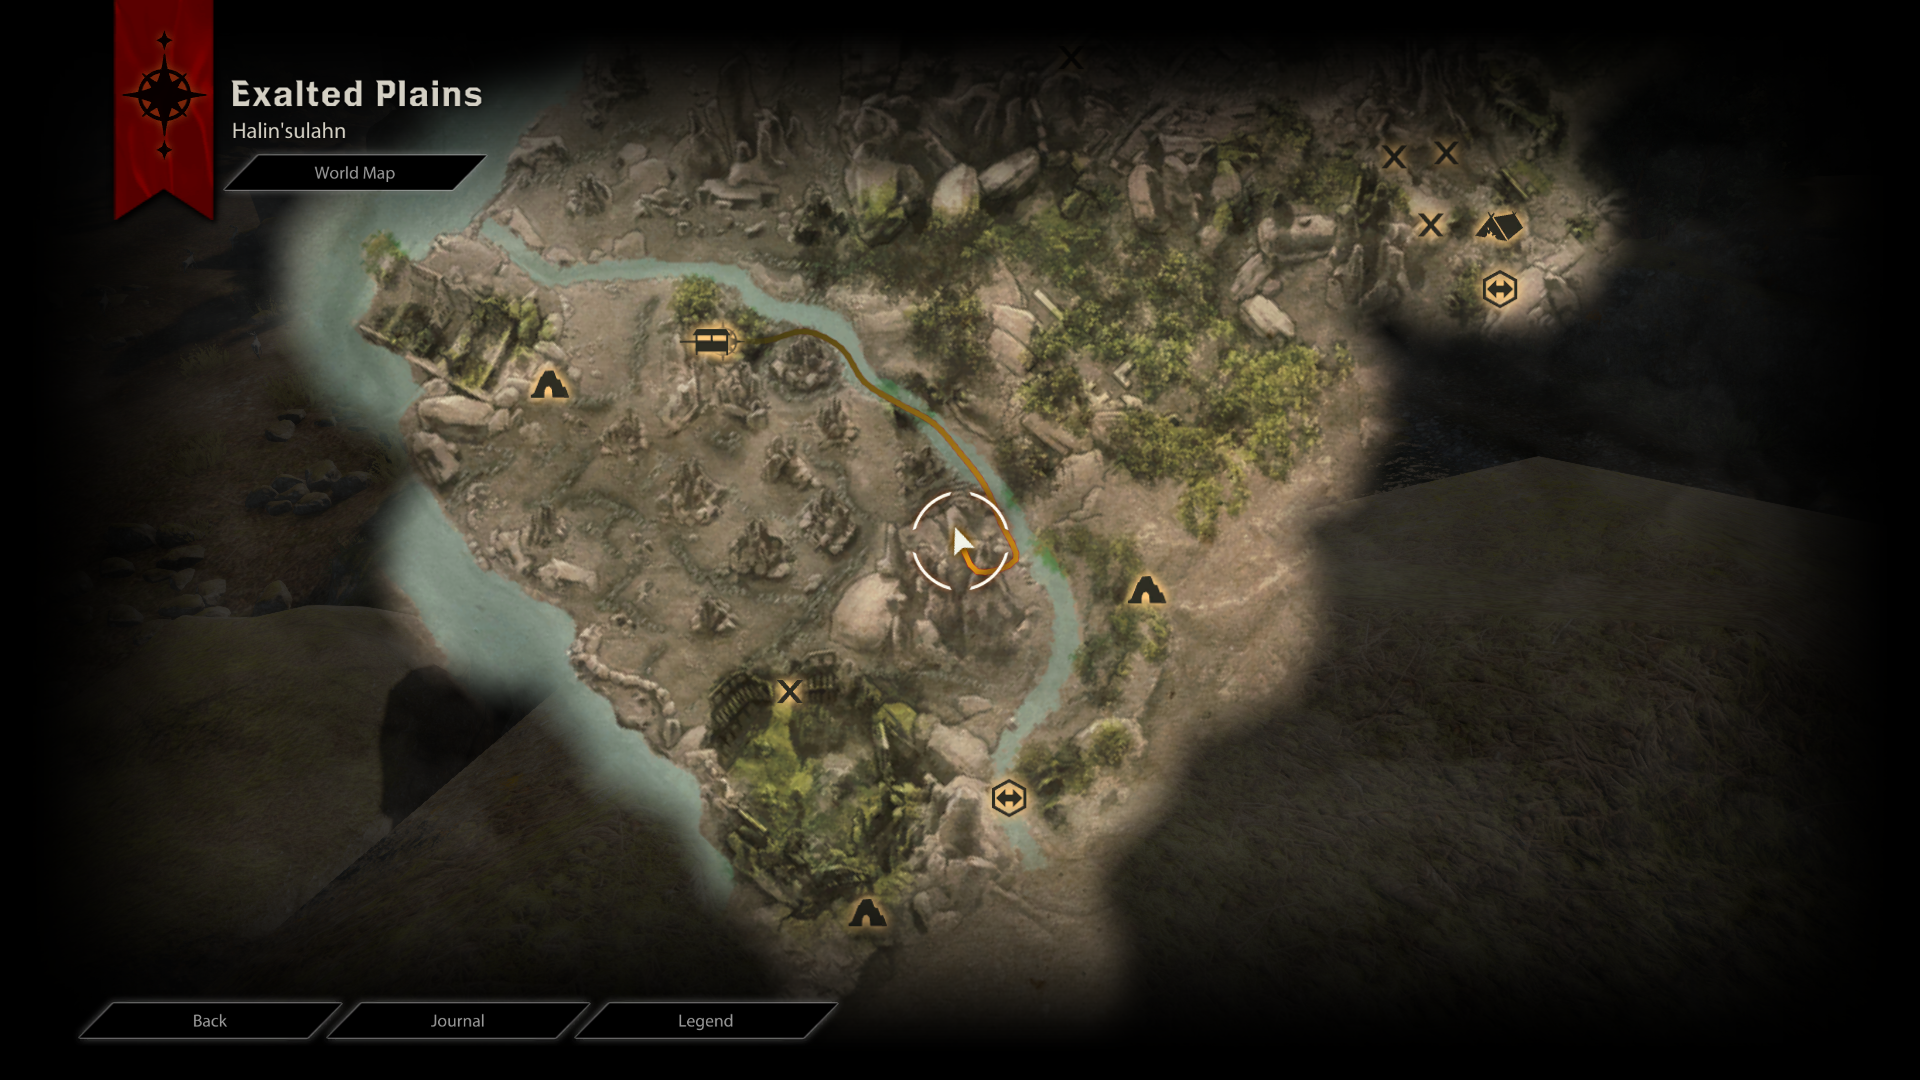 Map of halin sulahn walkthroughpng Image